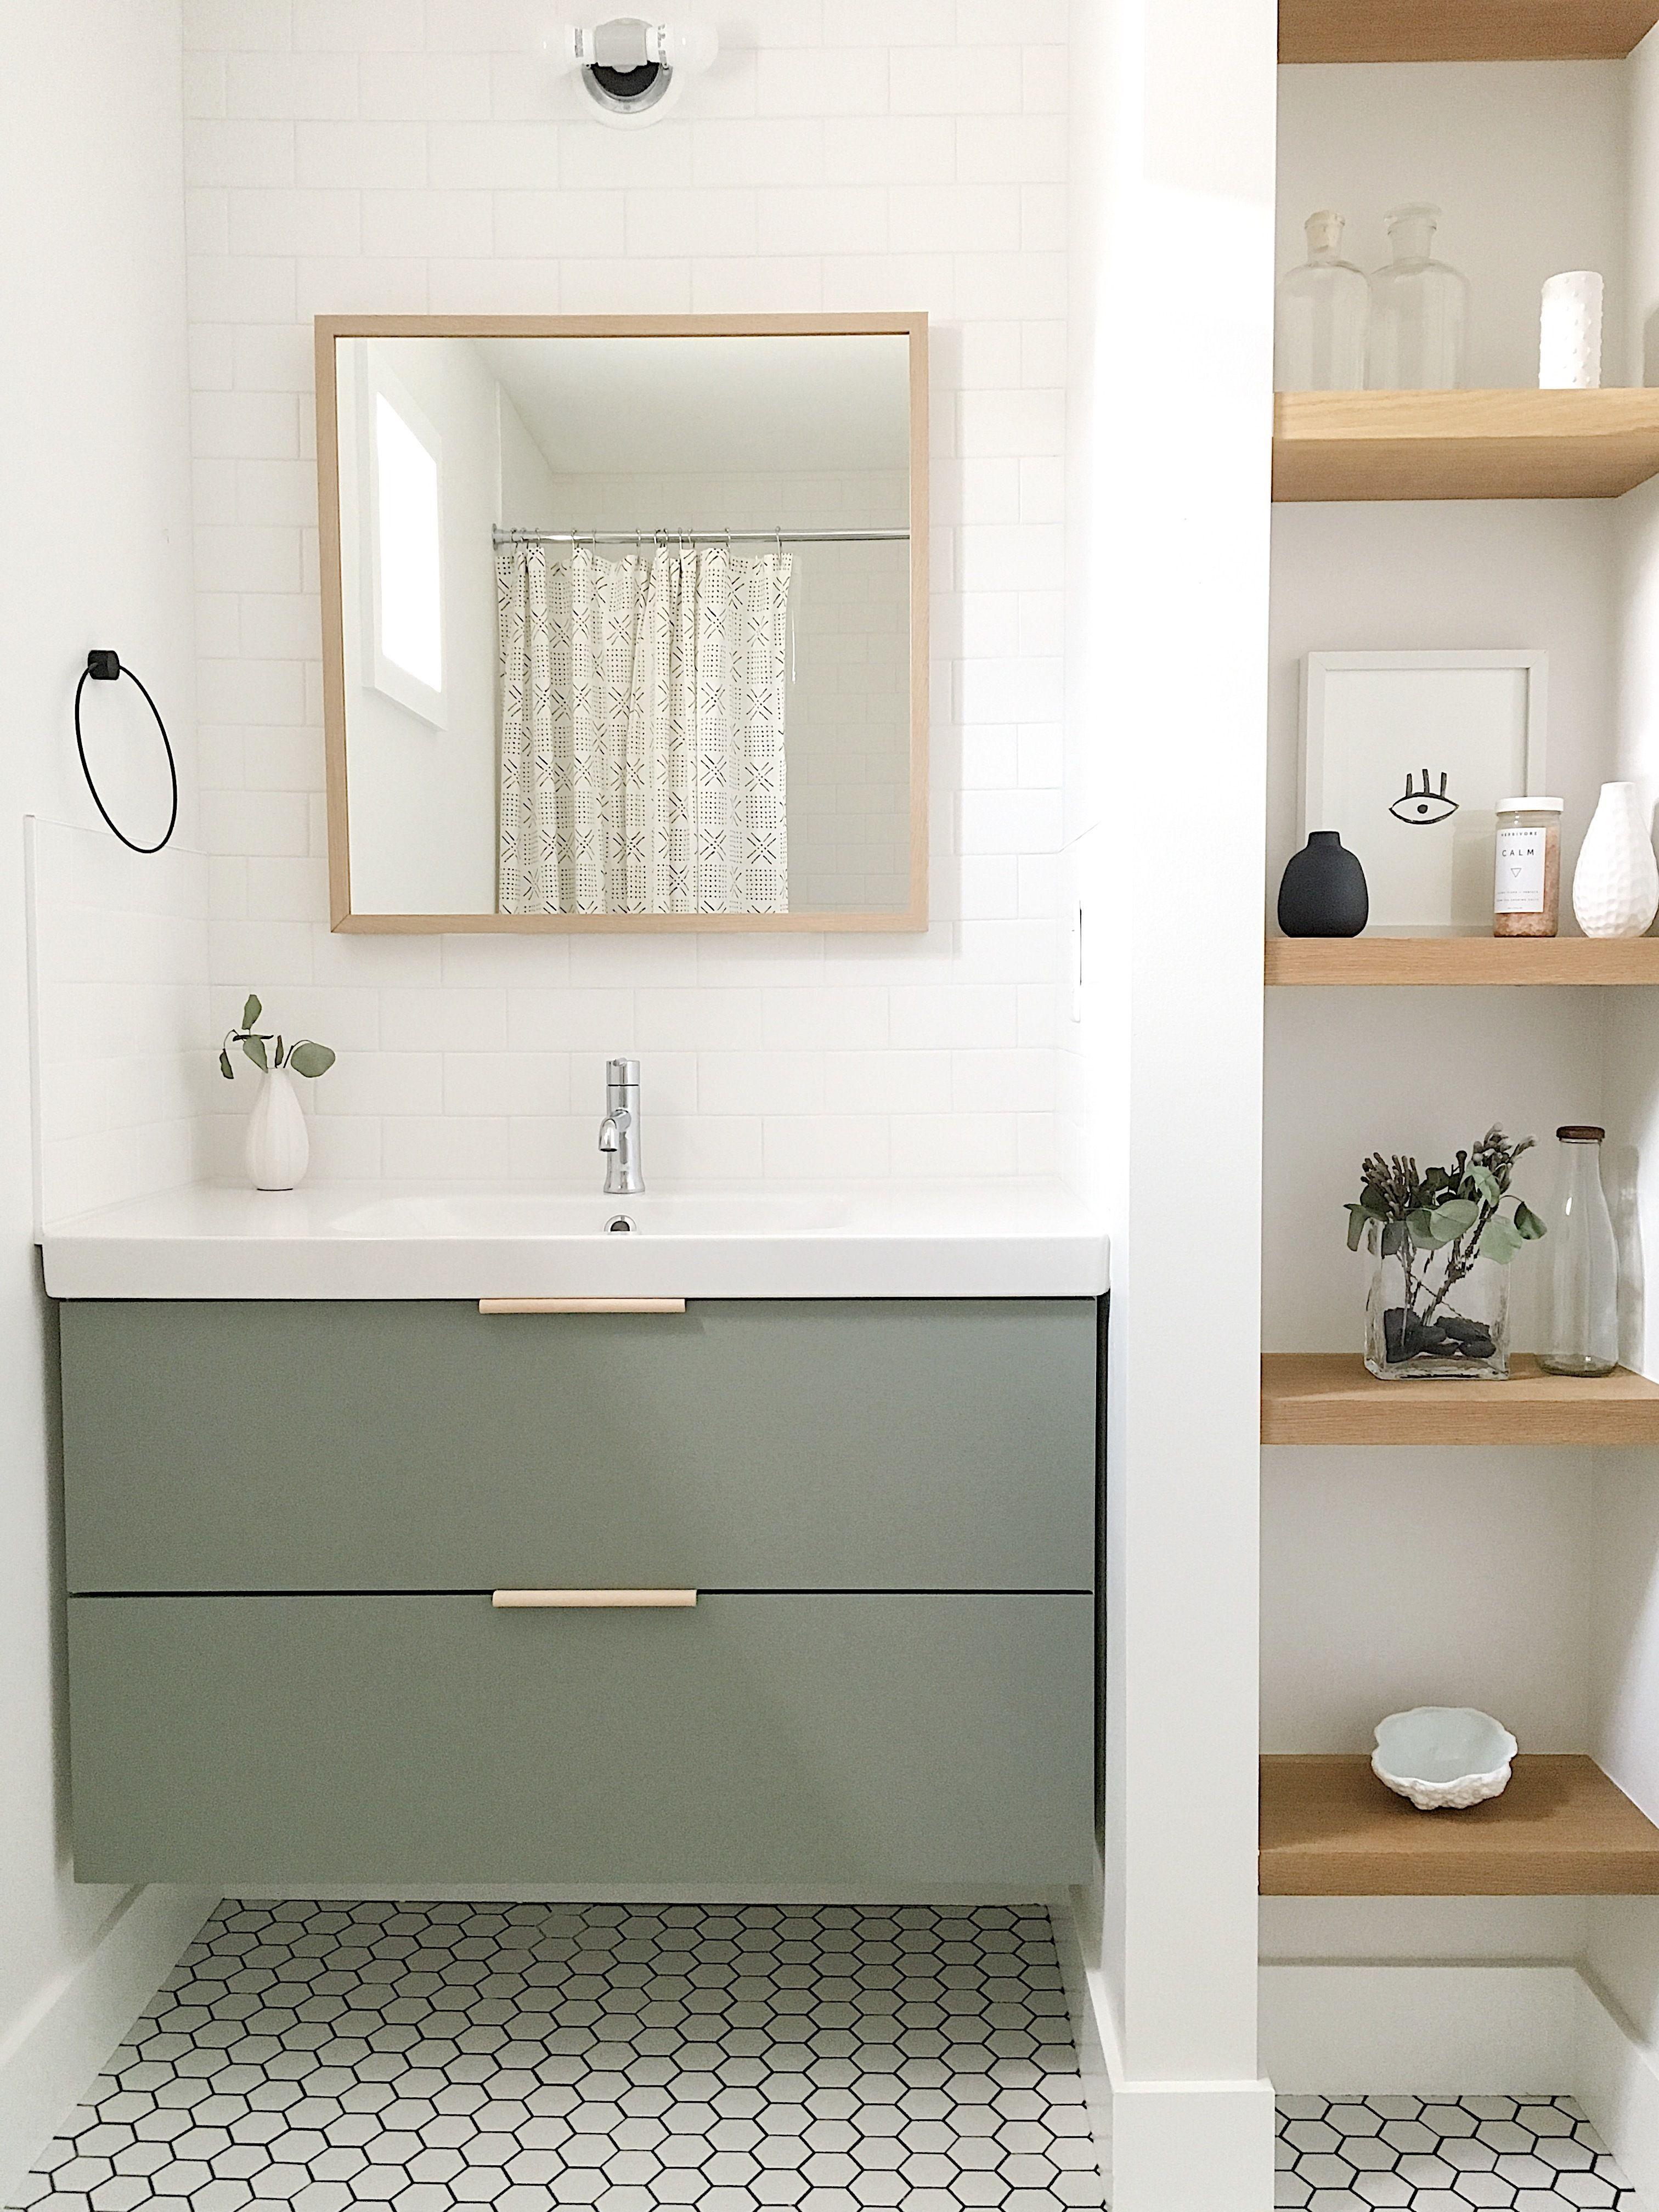 The Guest Bathroom Utilizes A Simple Ikea Vanity Custom Painted